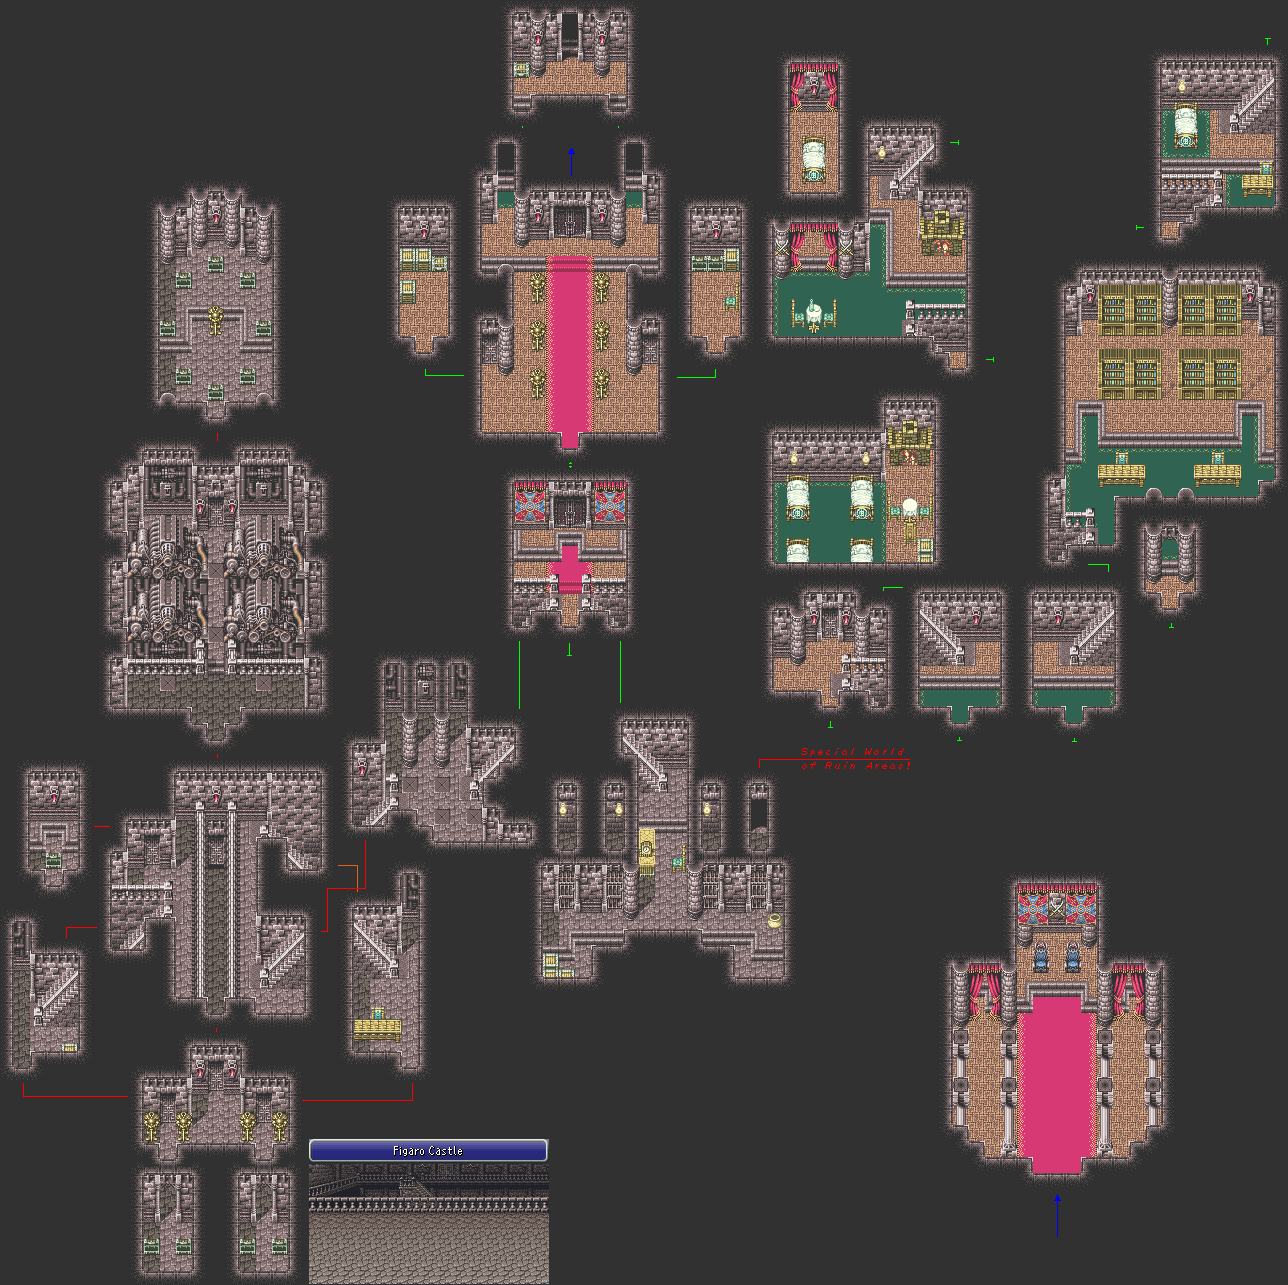 Final Fantasy 6 Gameboy Advance Castle Map | Final fantasy ...